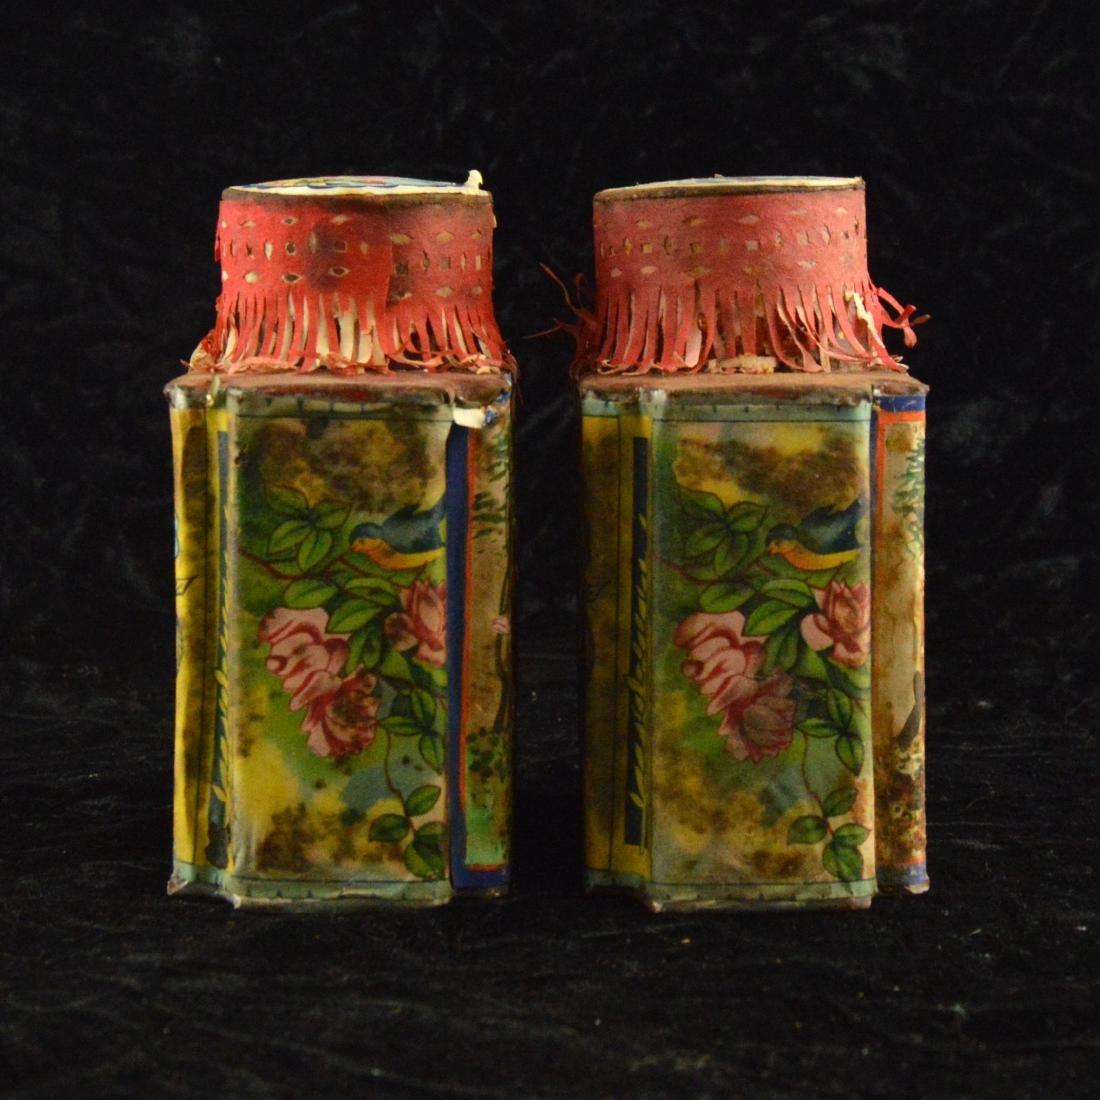 Chinese Republic Tea Tin Pair - 4